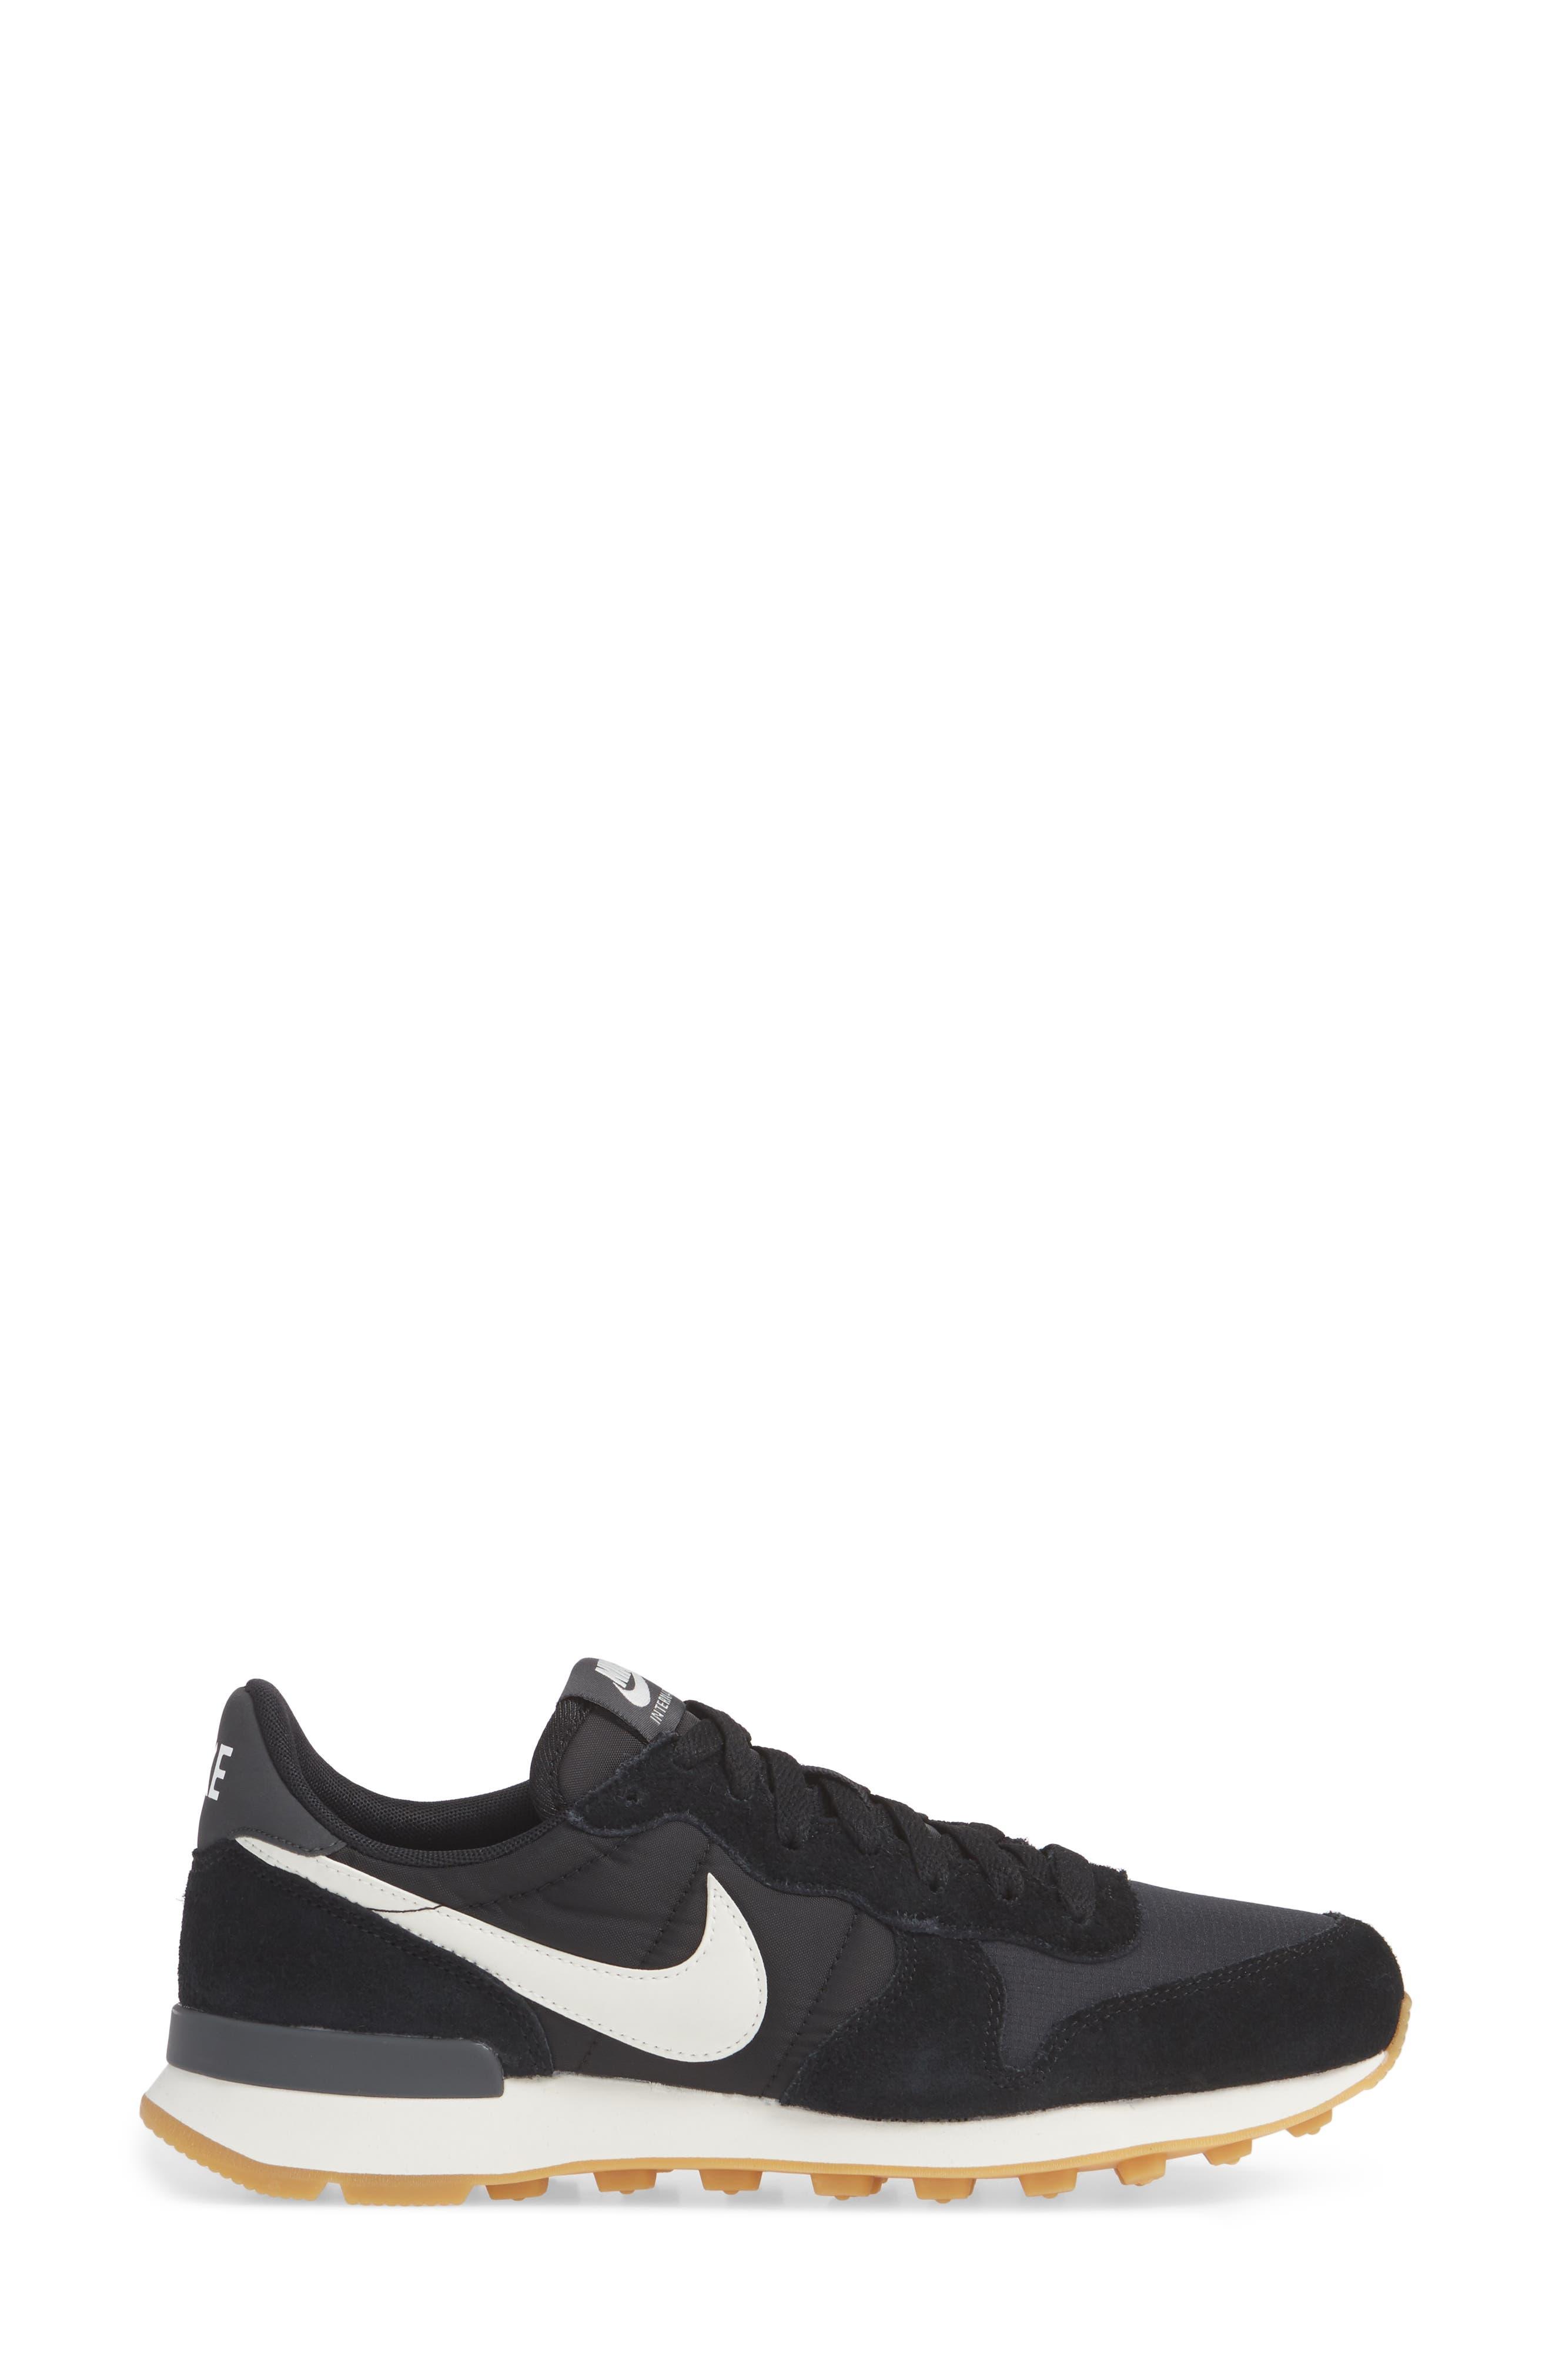 NIKE, 'Internationalist' Sneaker, Alternate thumbnail 3, color, 001